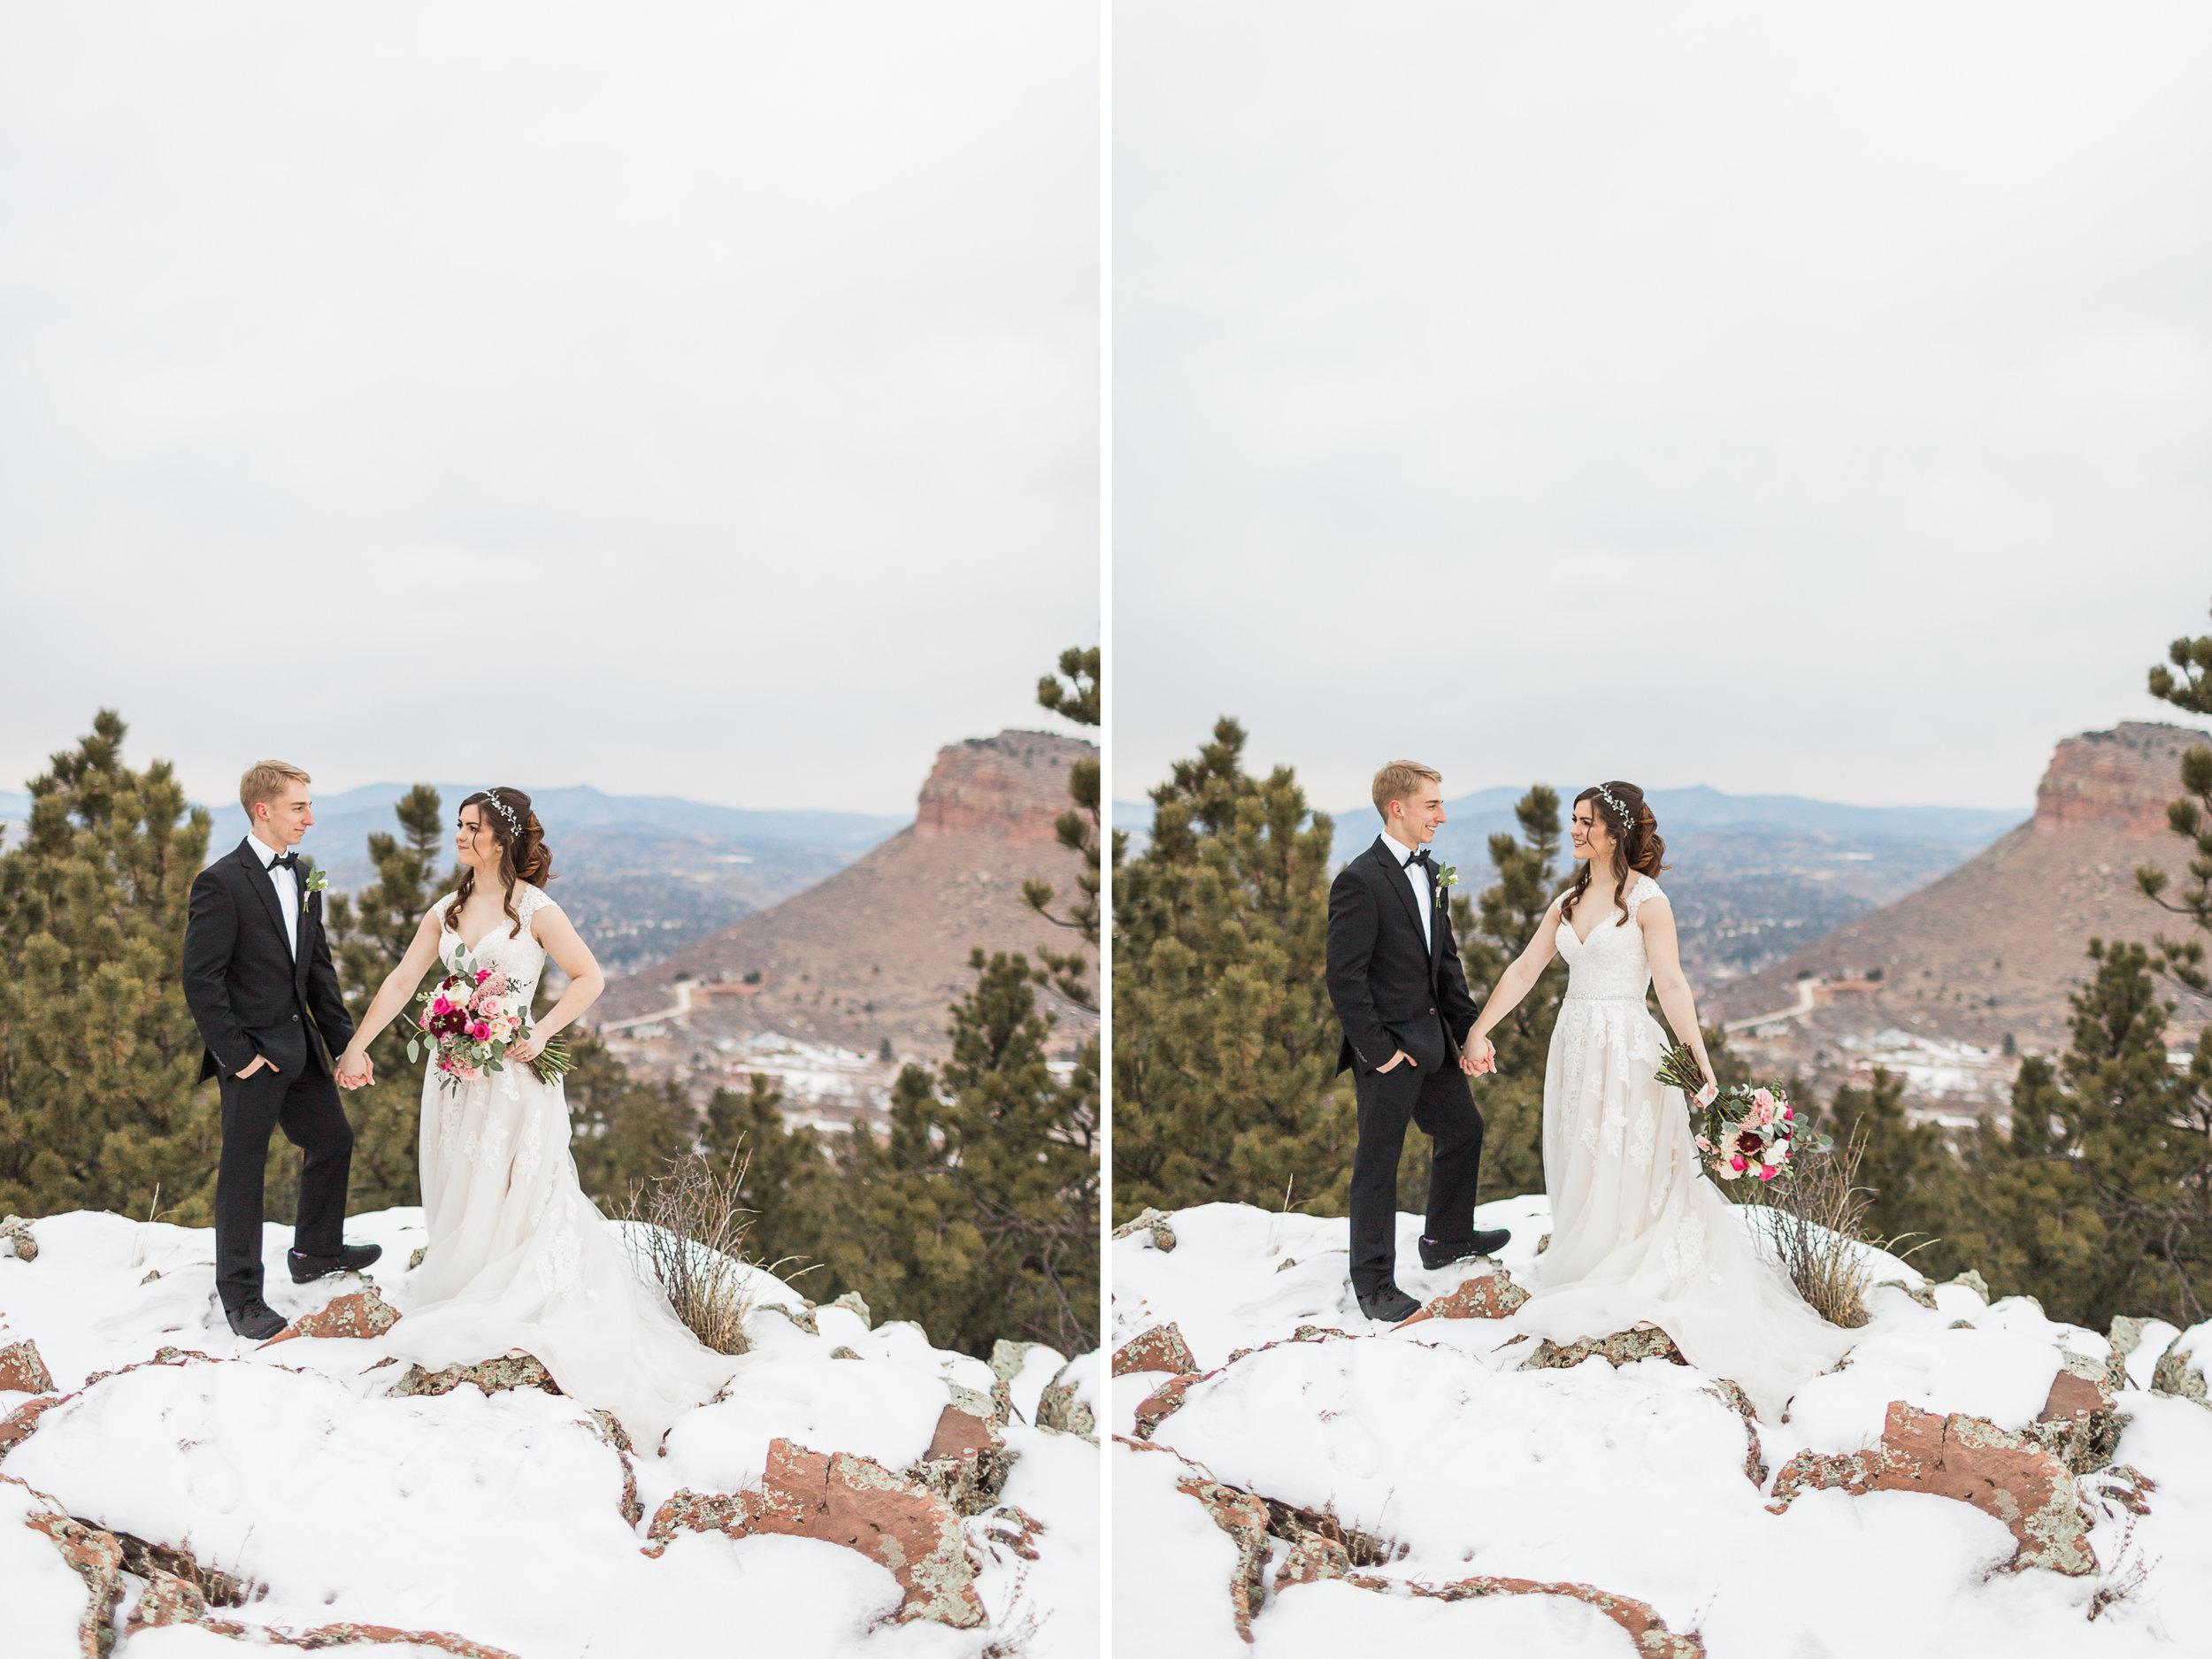 romanticcoloradodestinationwedding-8.jpg